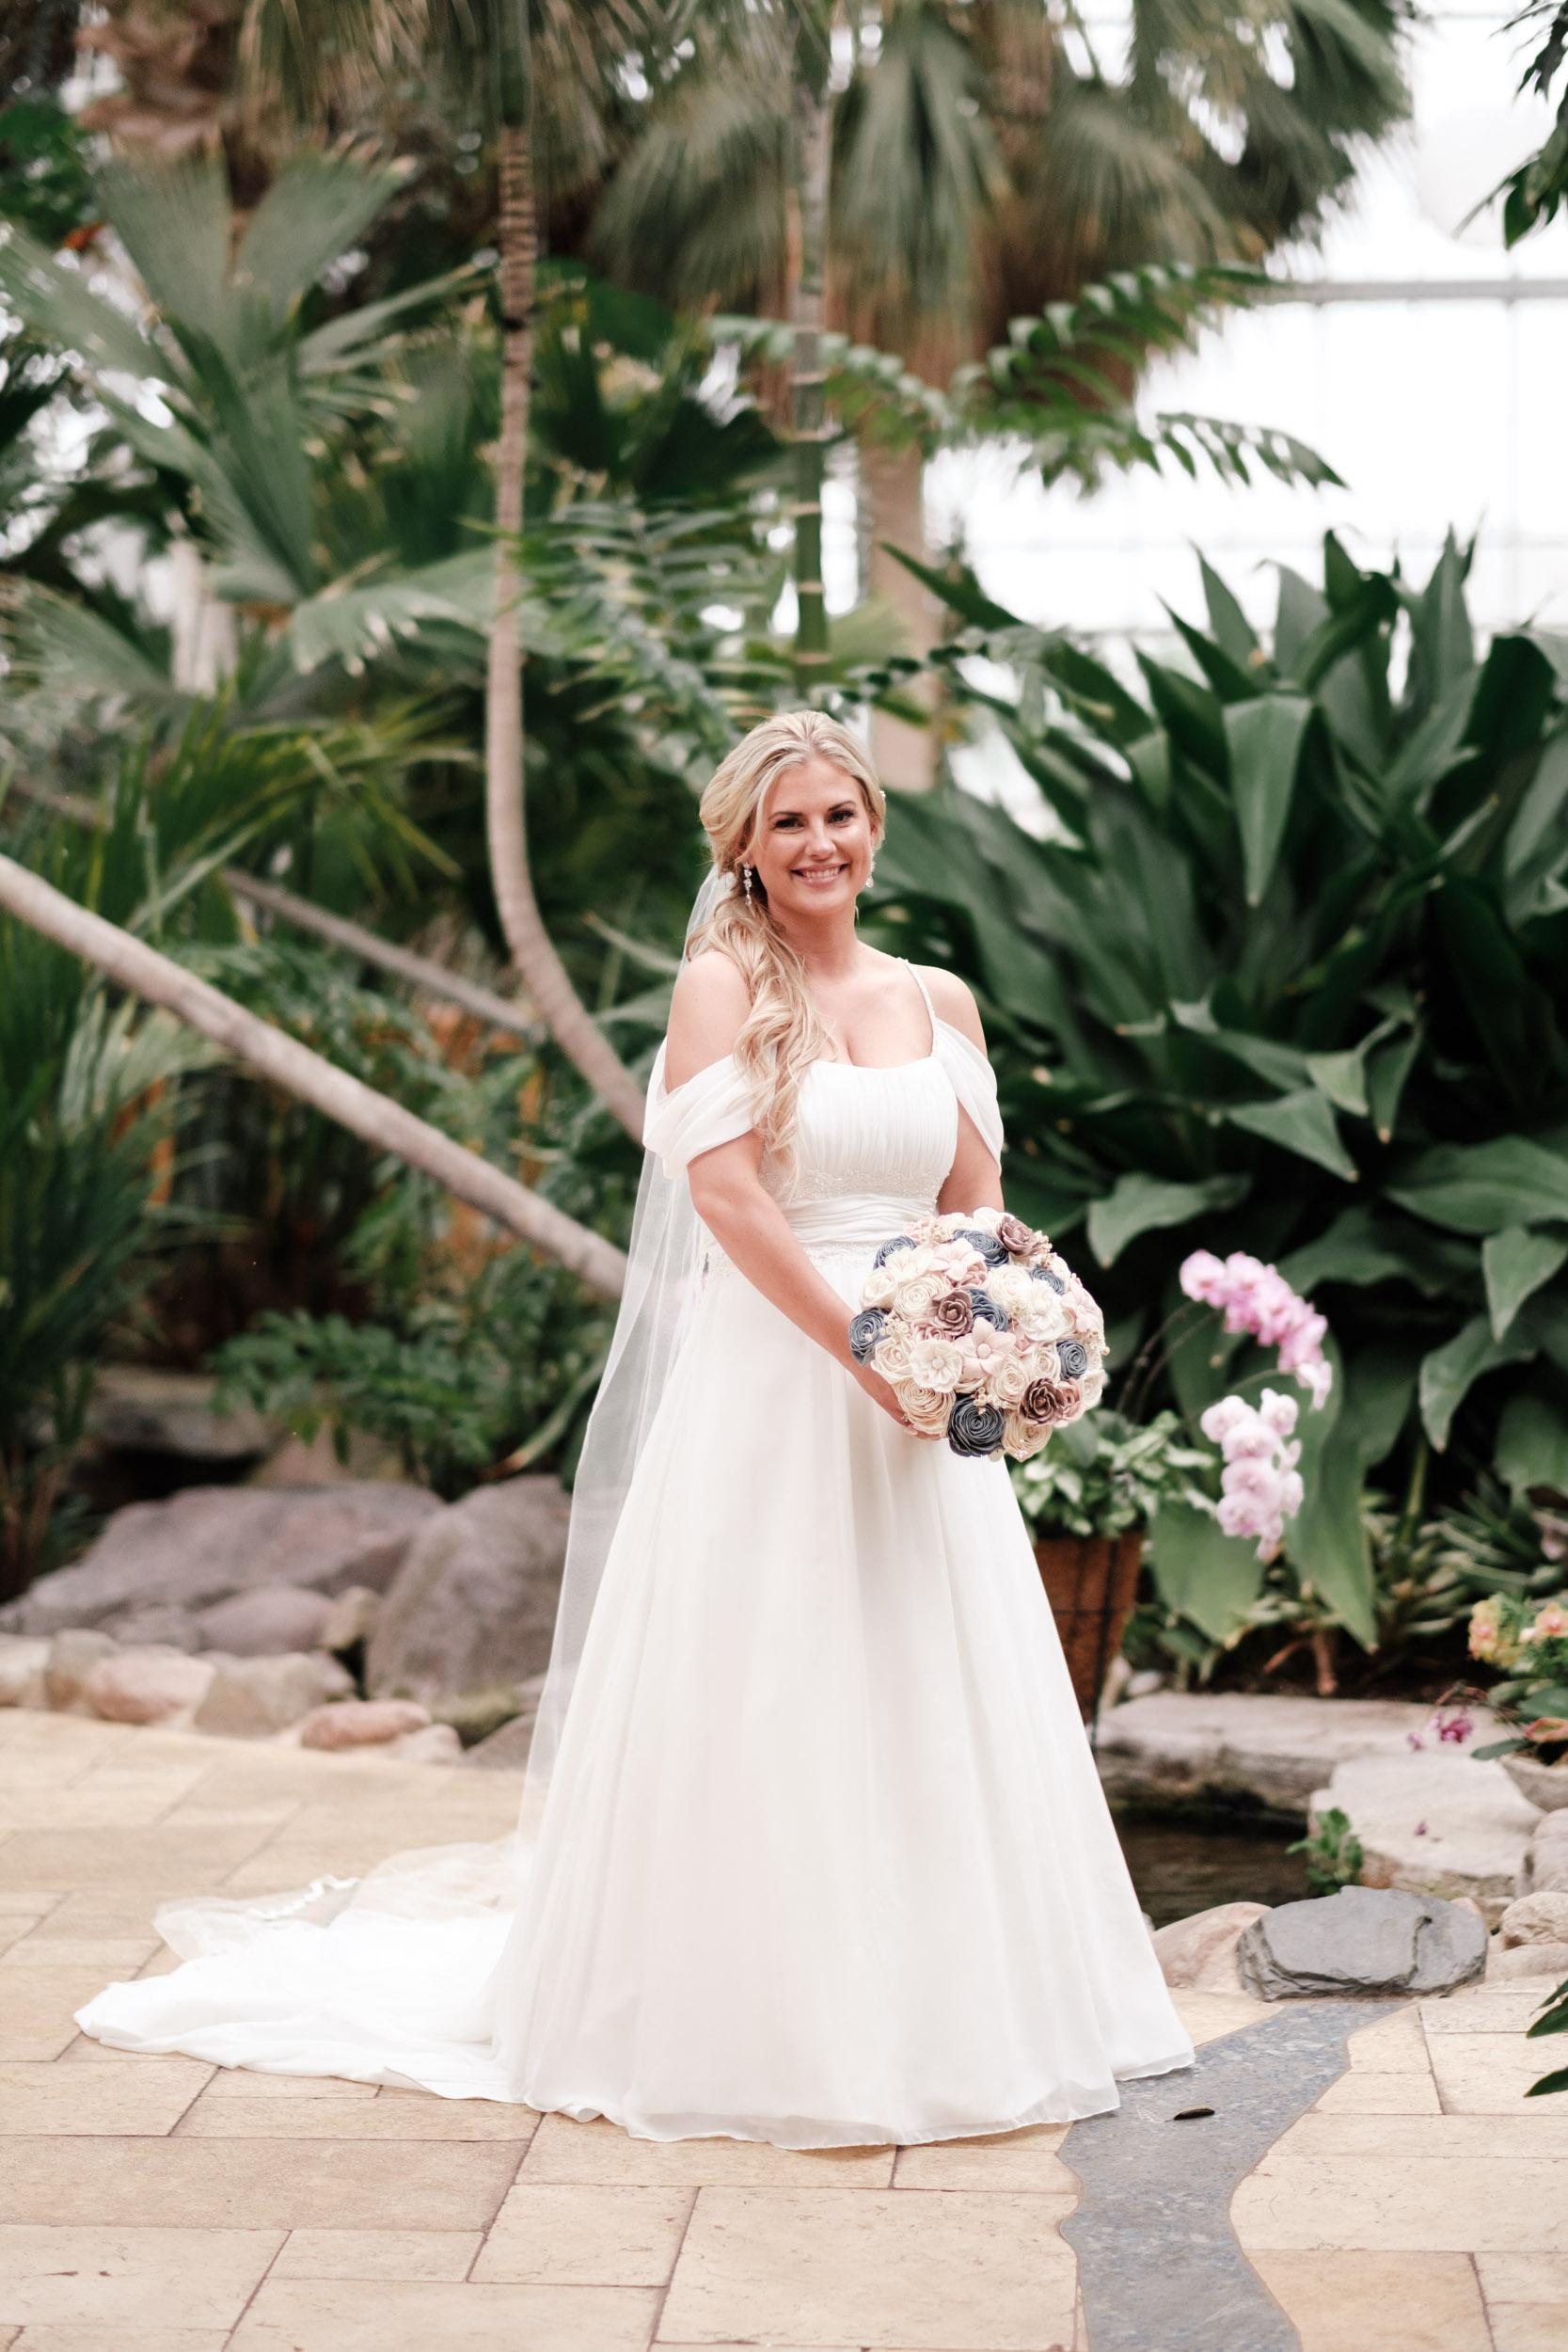 19-06-01 Megan Josh - Nicholas Conservatory Wedding-31.jpg